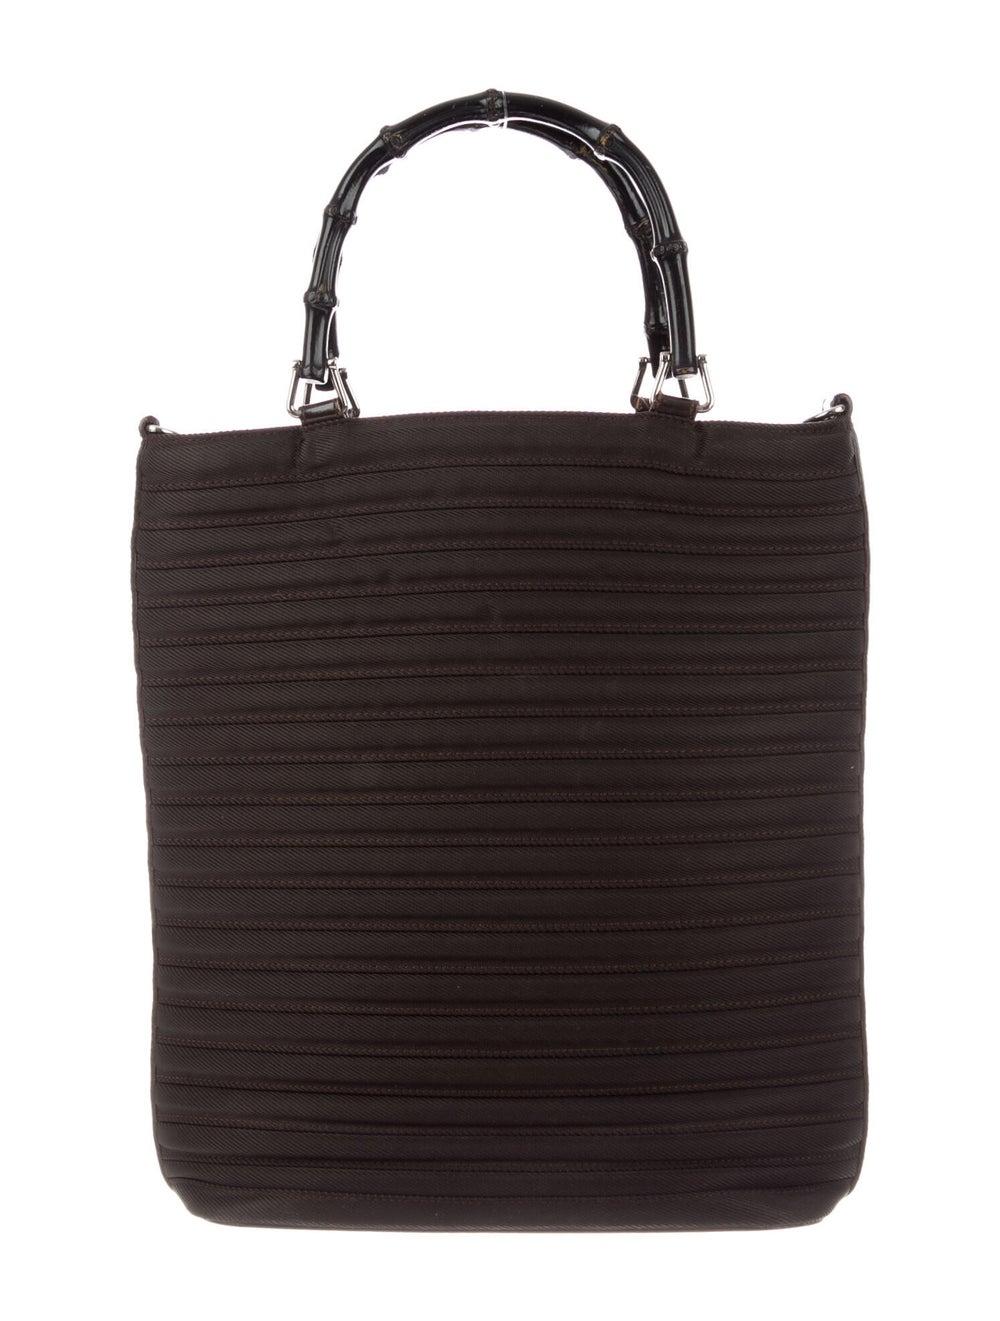 Gucci Vintage Diana Nylon Bamboo Handle Bag Brown - image 4